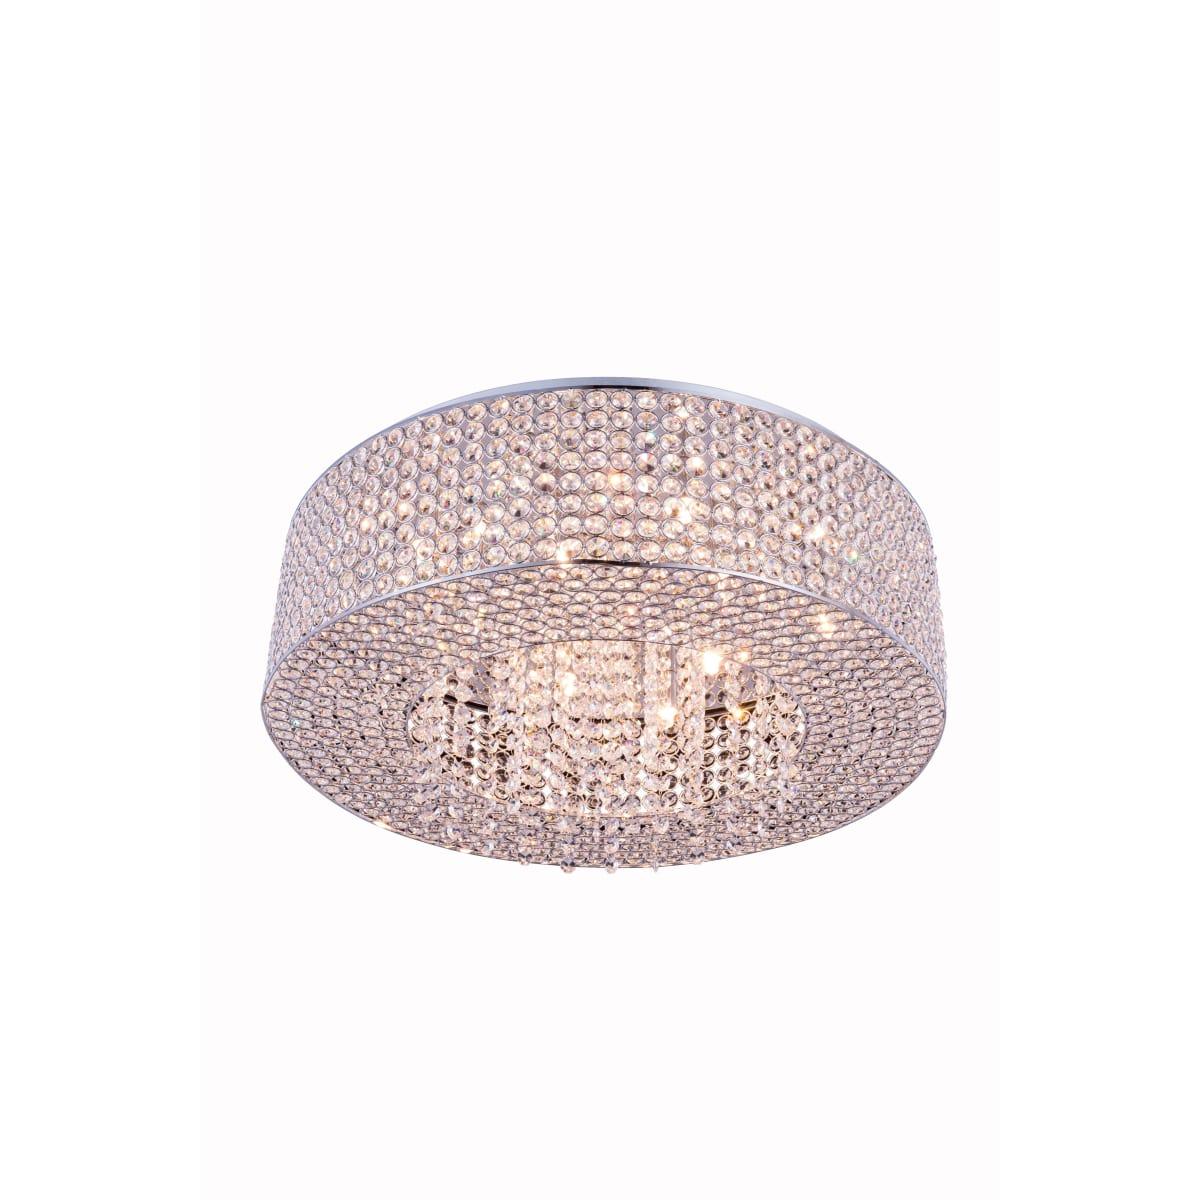 Elegant Lighting 2914f24